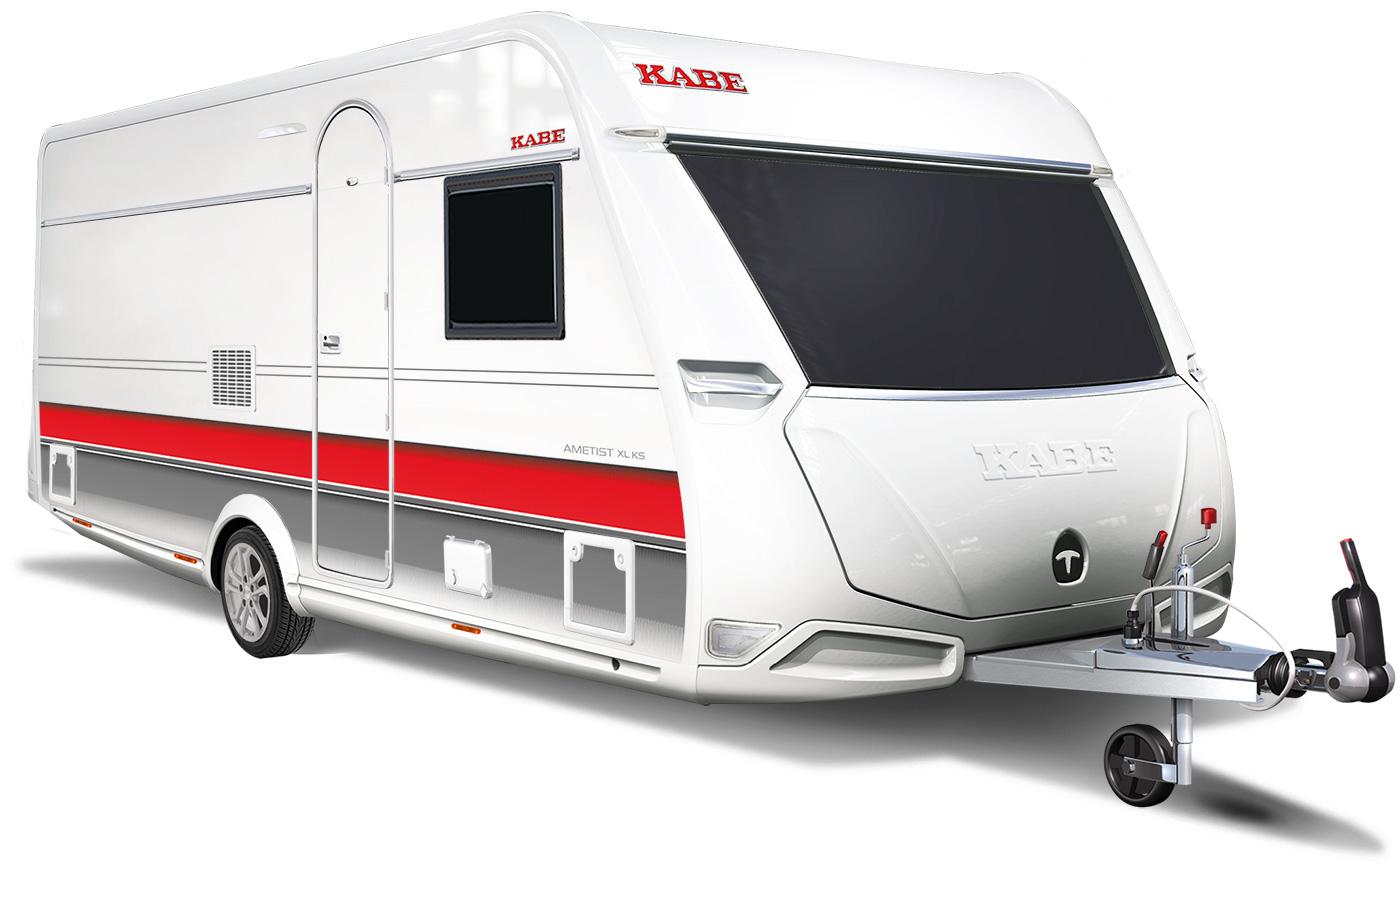 Kabe Ametist 560 XL